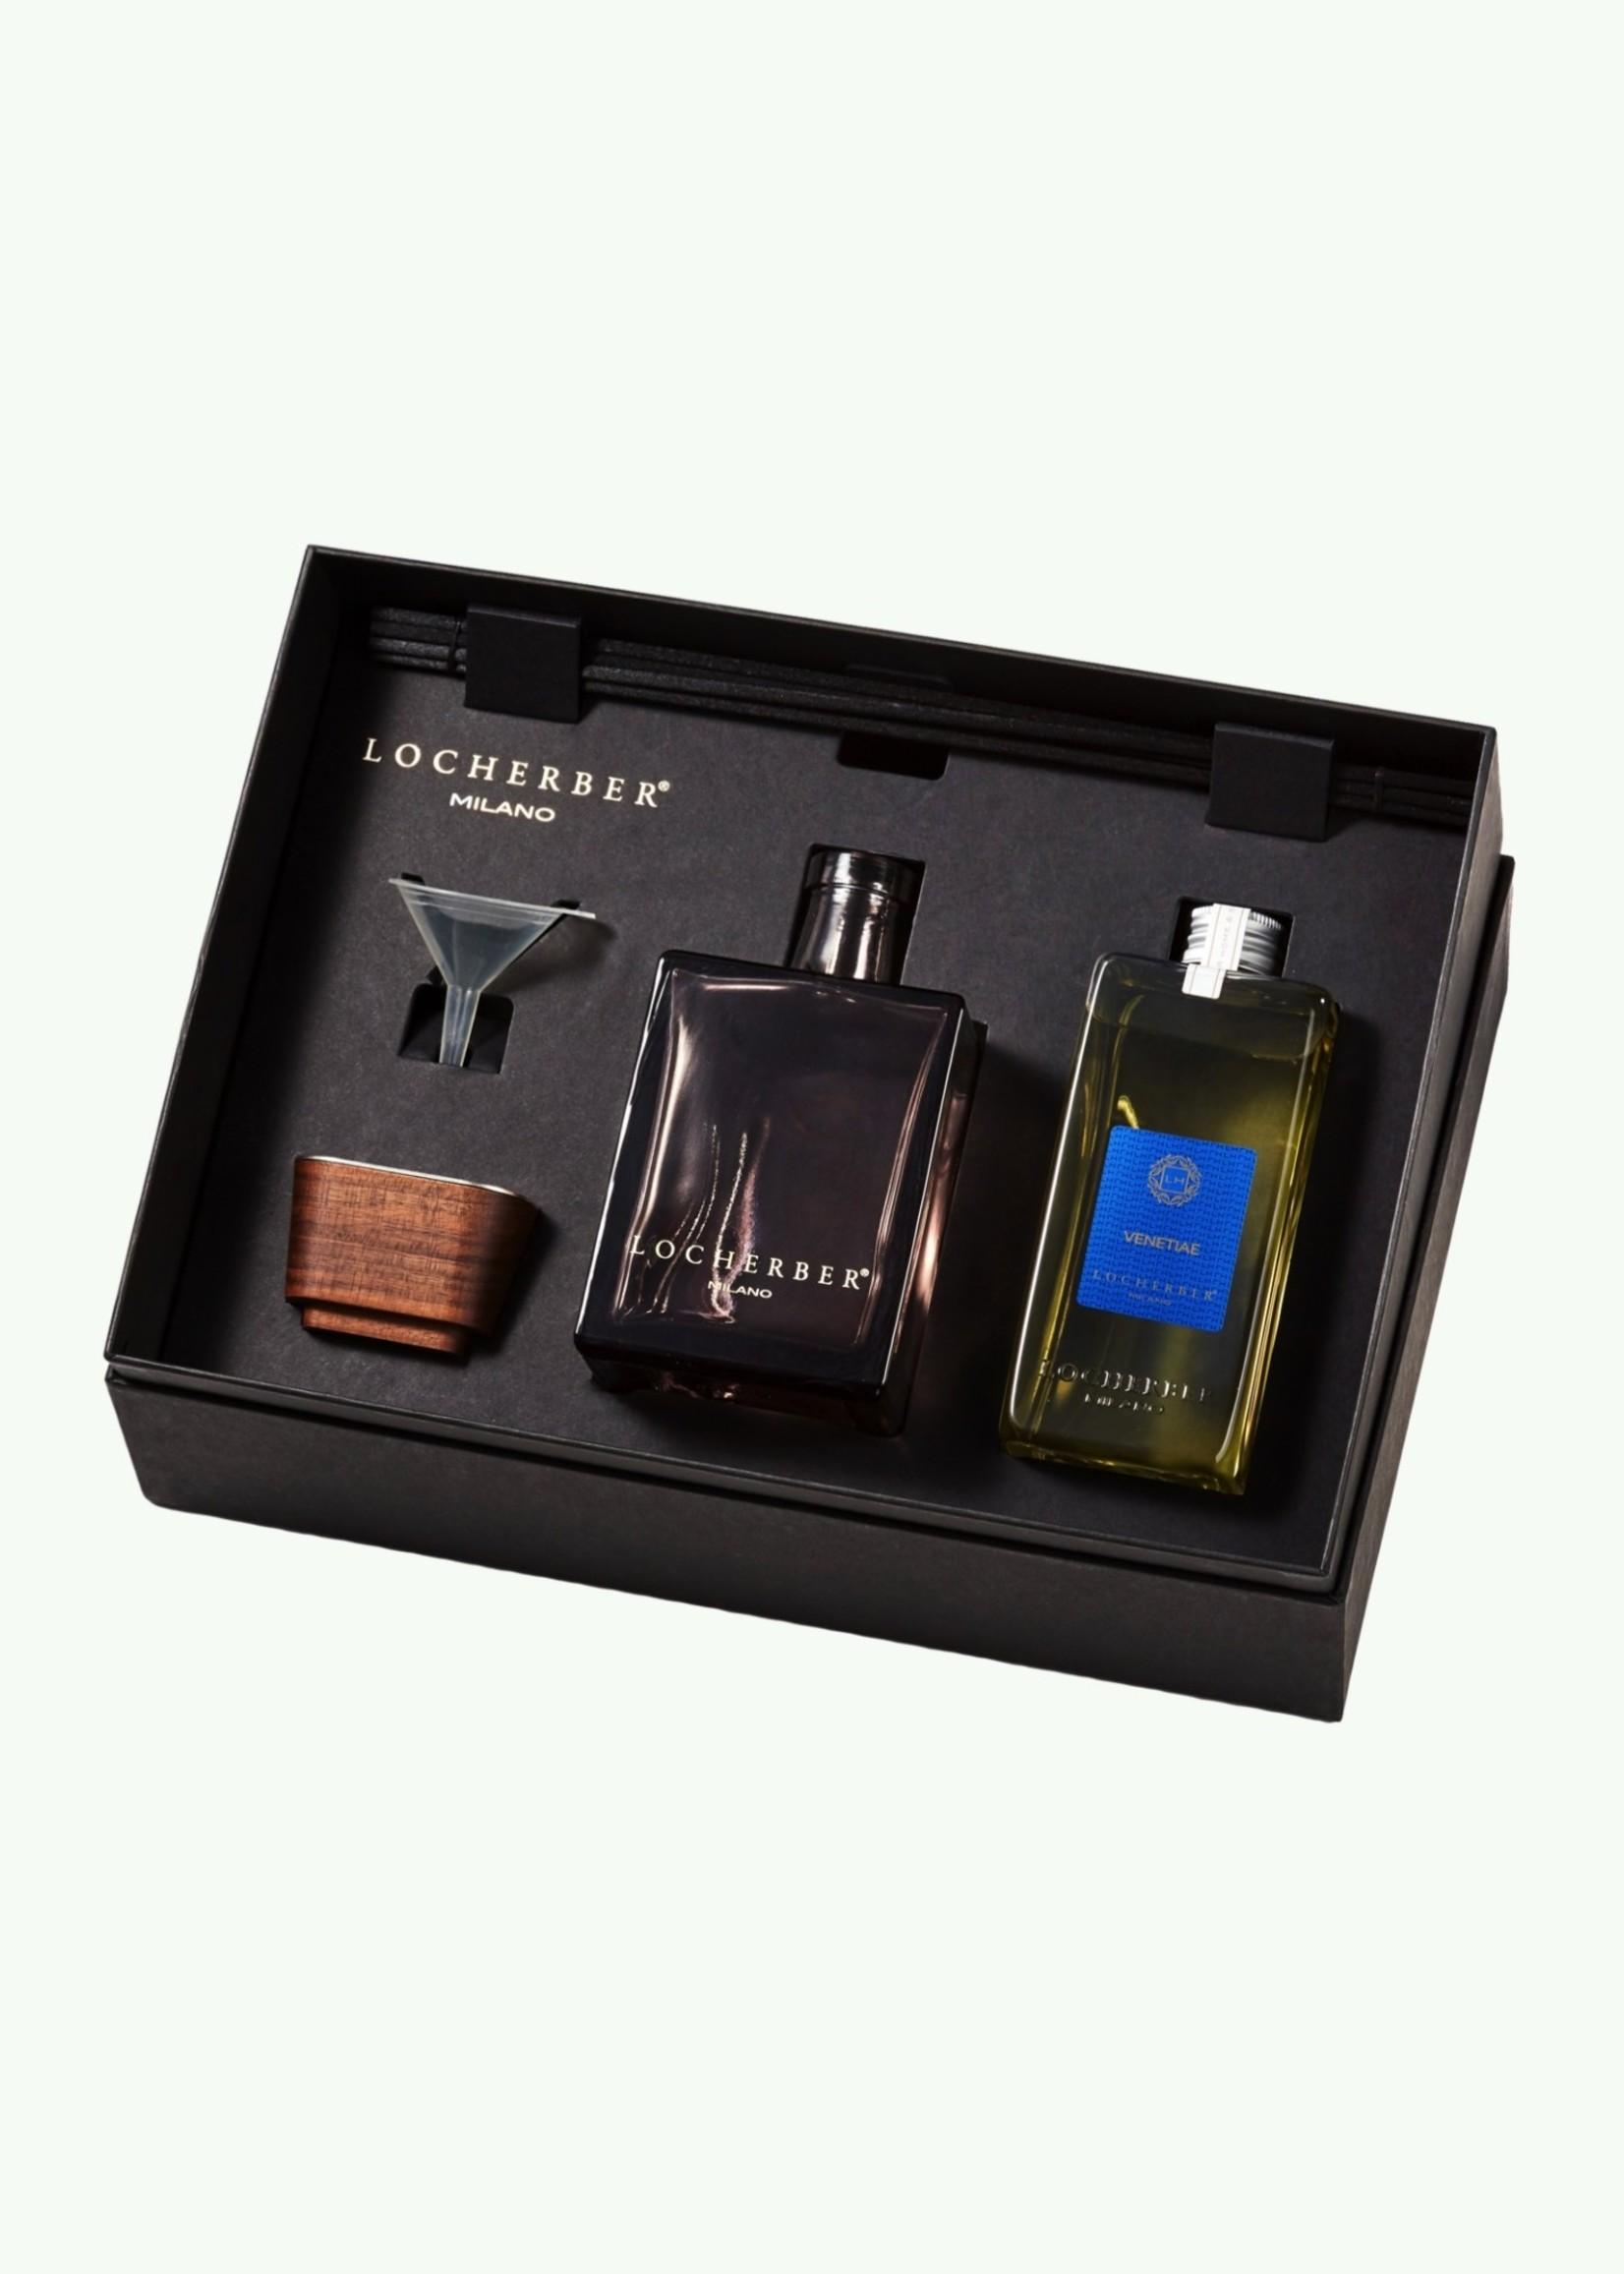 Locherber Locherber Milano - Venetiae - Diffuser Gift Set